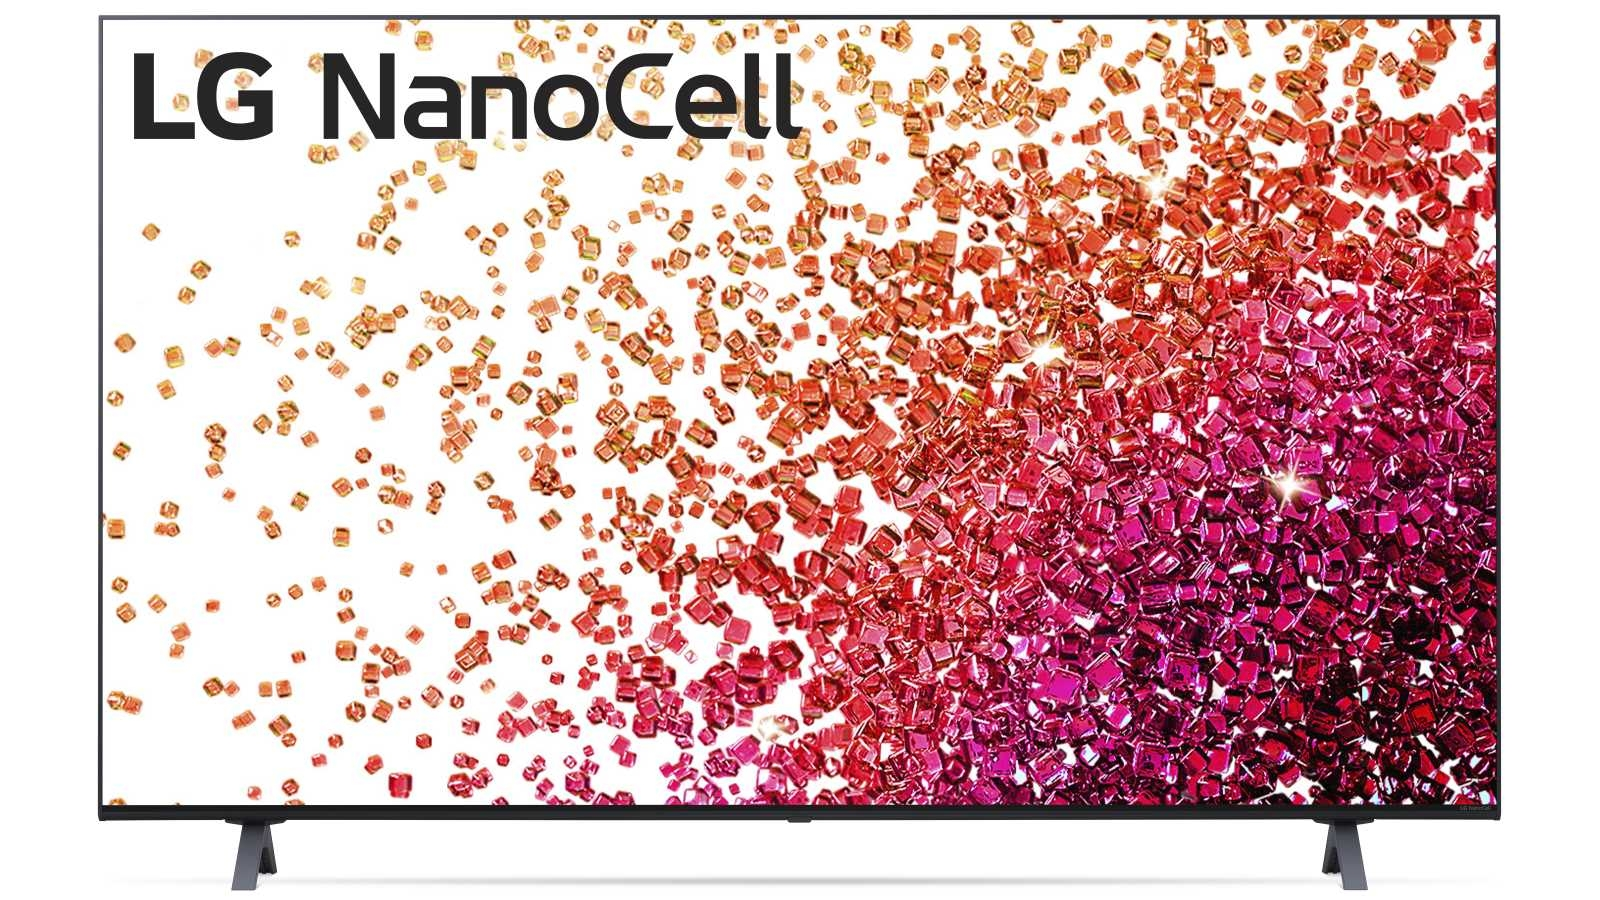 Image of LG 65-inch Nano75 4K UHD NanoCell LED LCD Ai ThinQ Smart TV